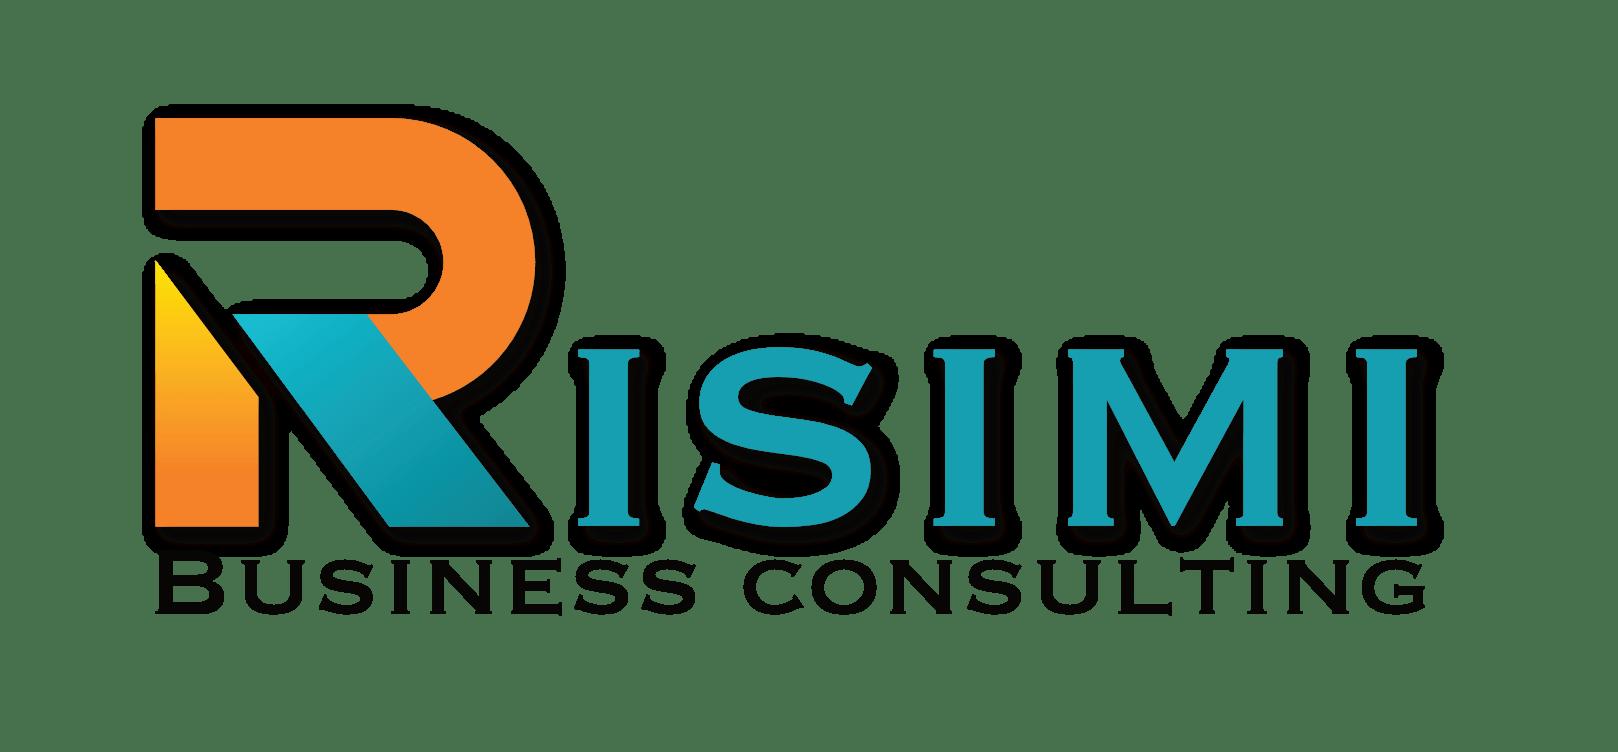 Risimi Business Consulting